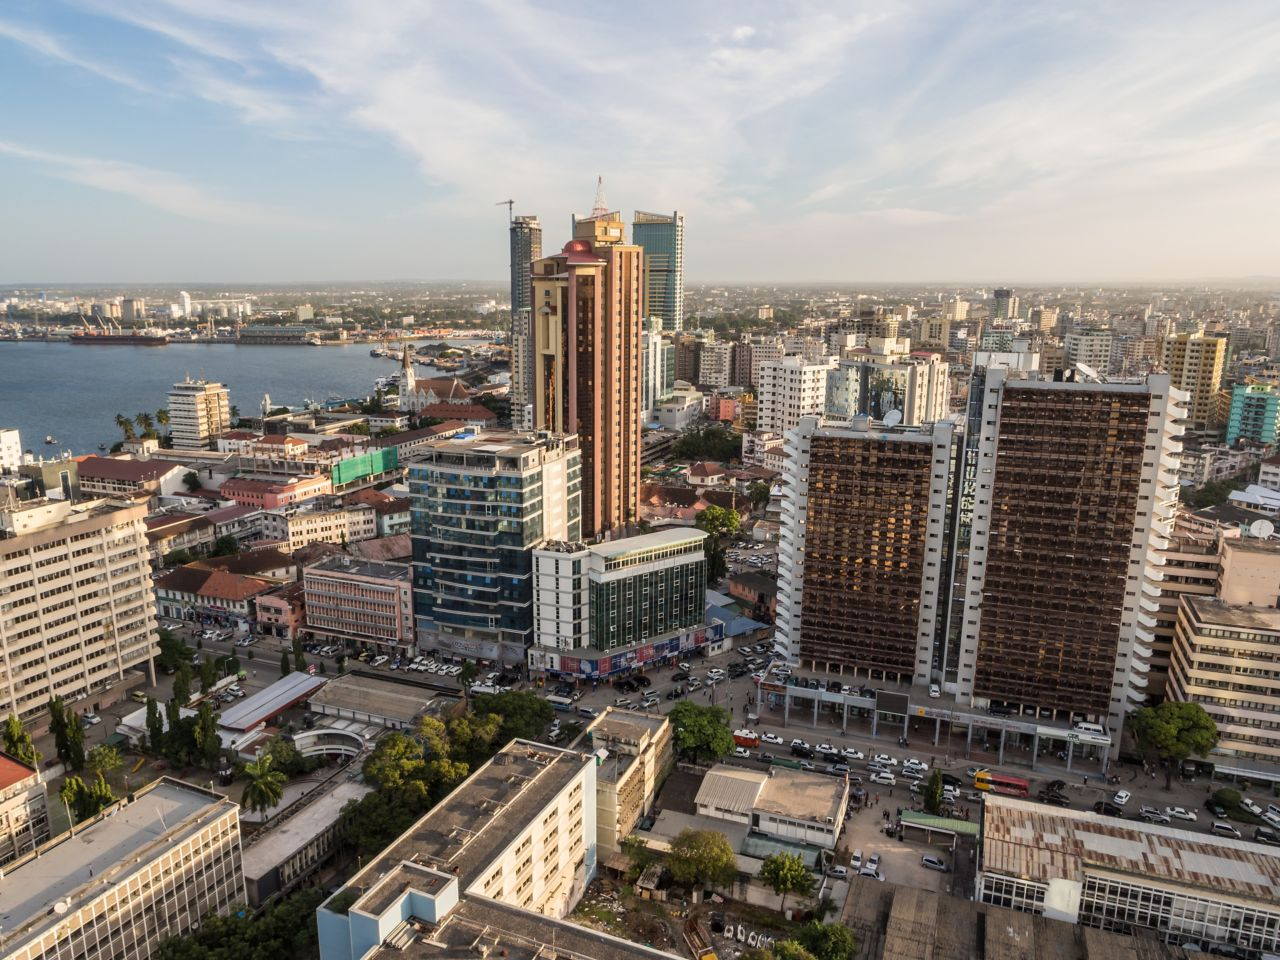 The skyline of Dar-el-Salaam in Tanzania